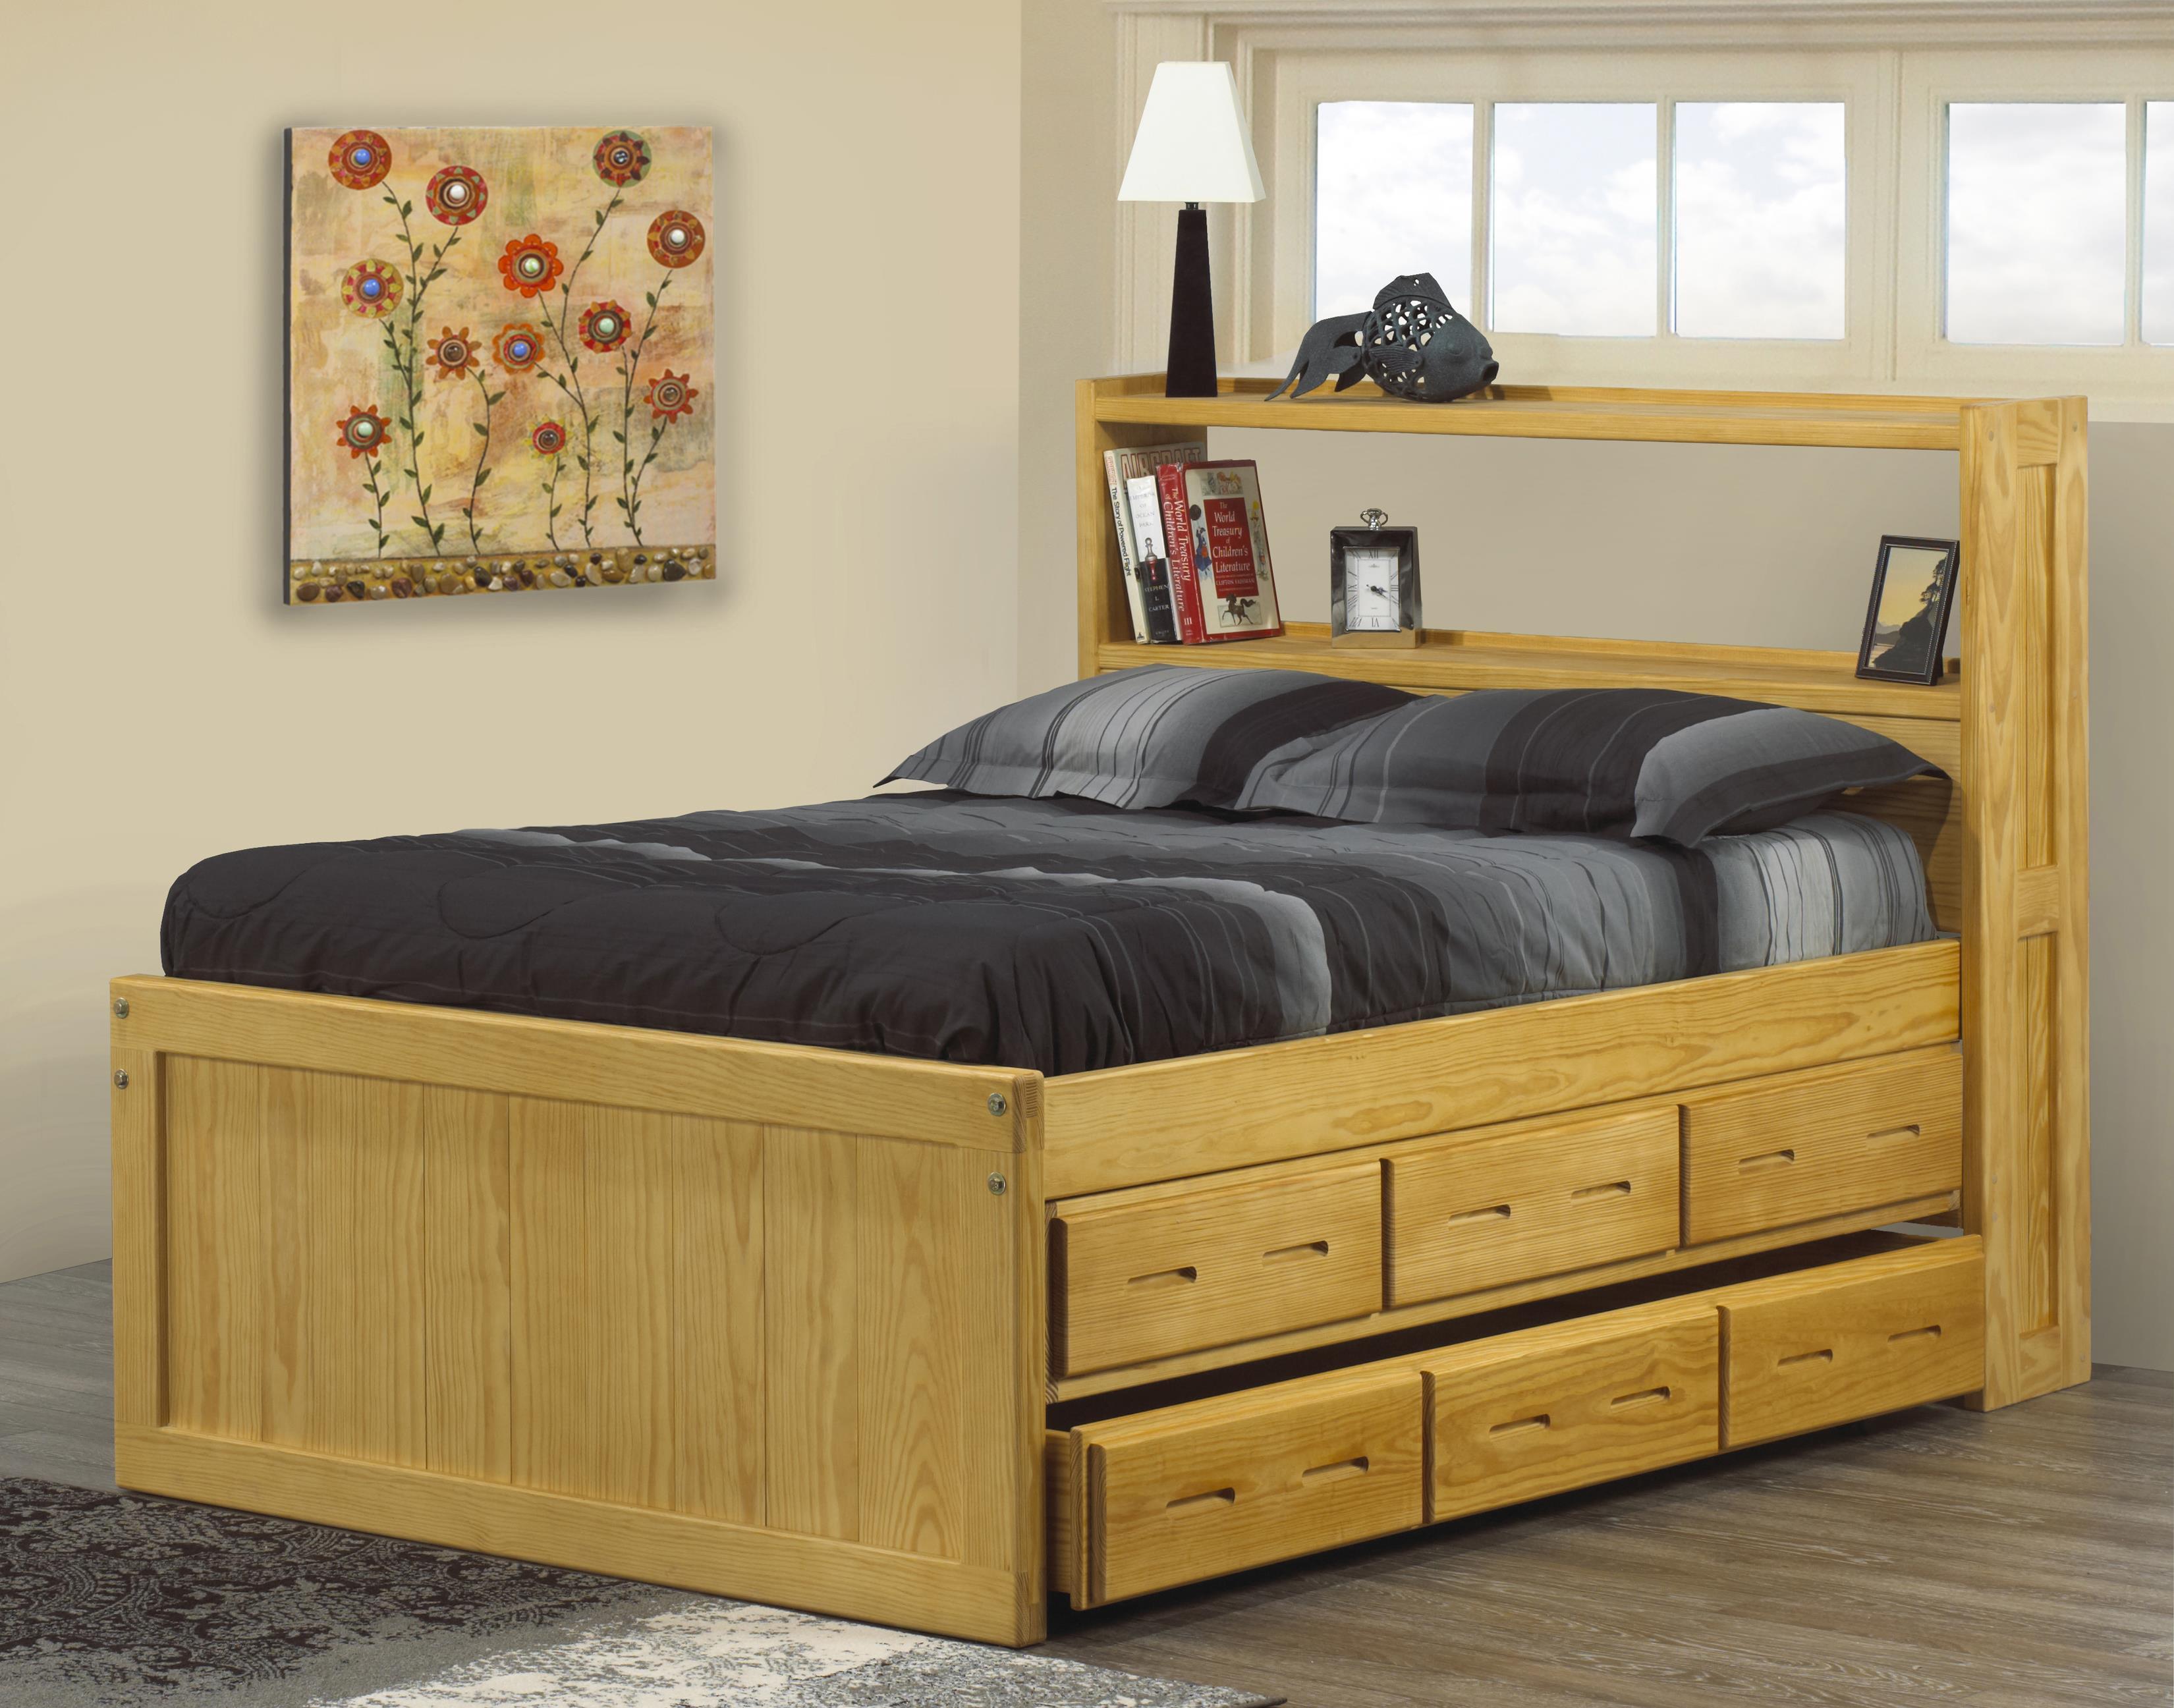 Crate Designs Crate Designs Bedroom Double Captain S